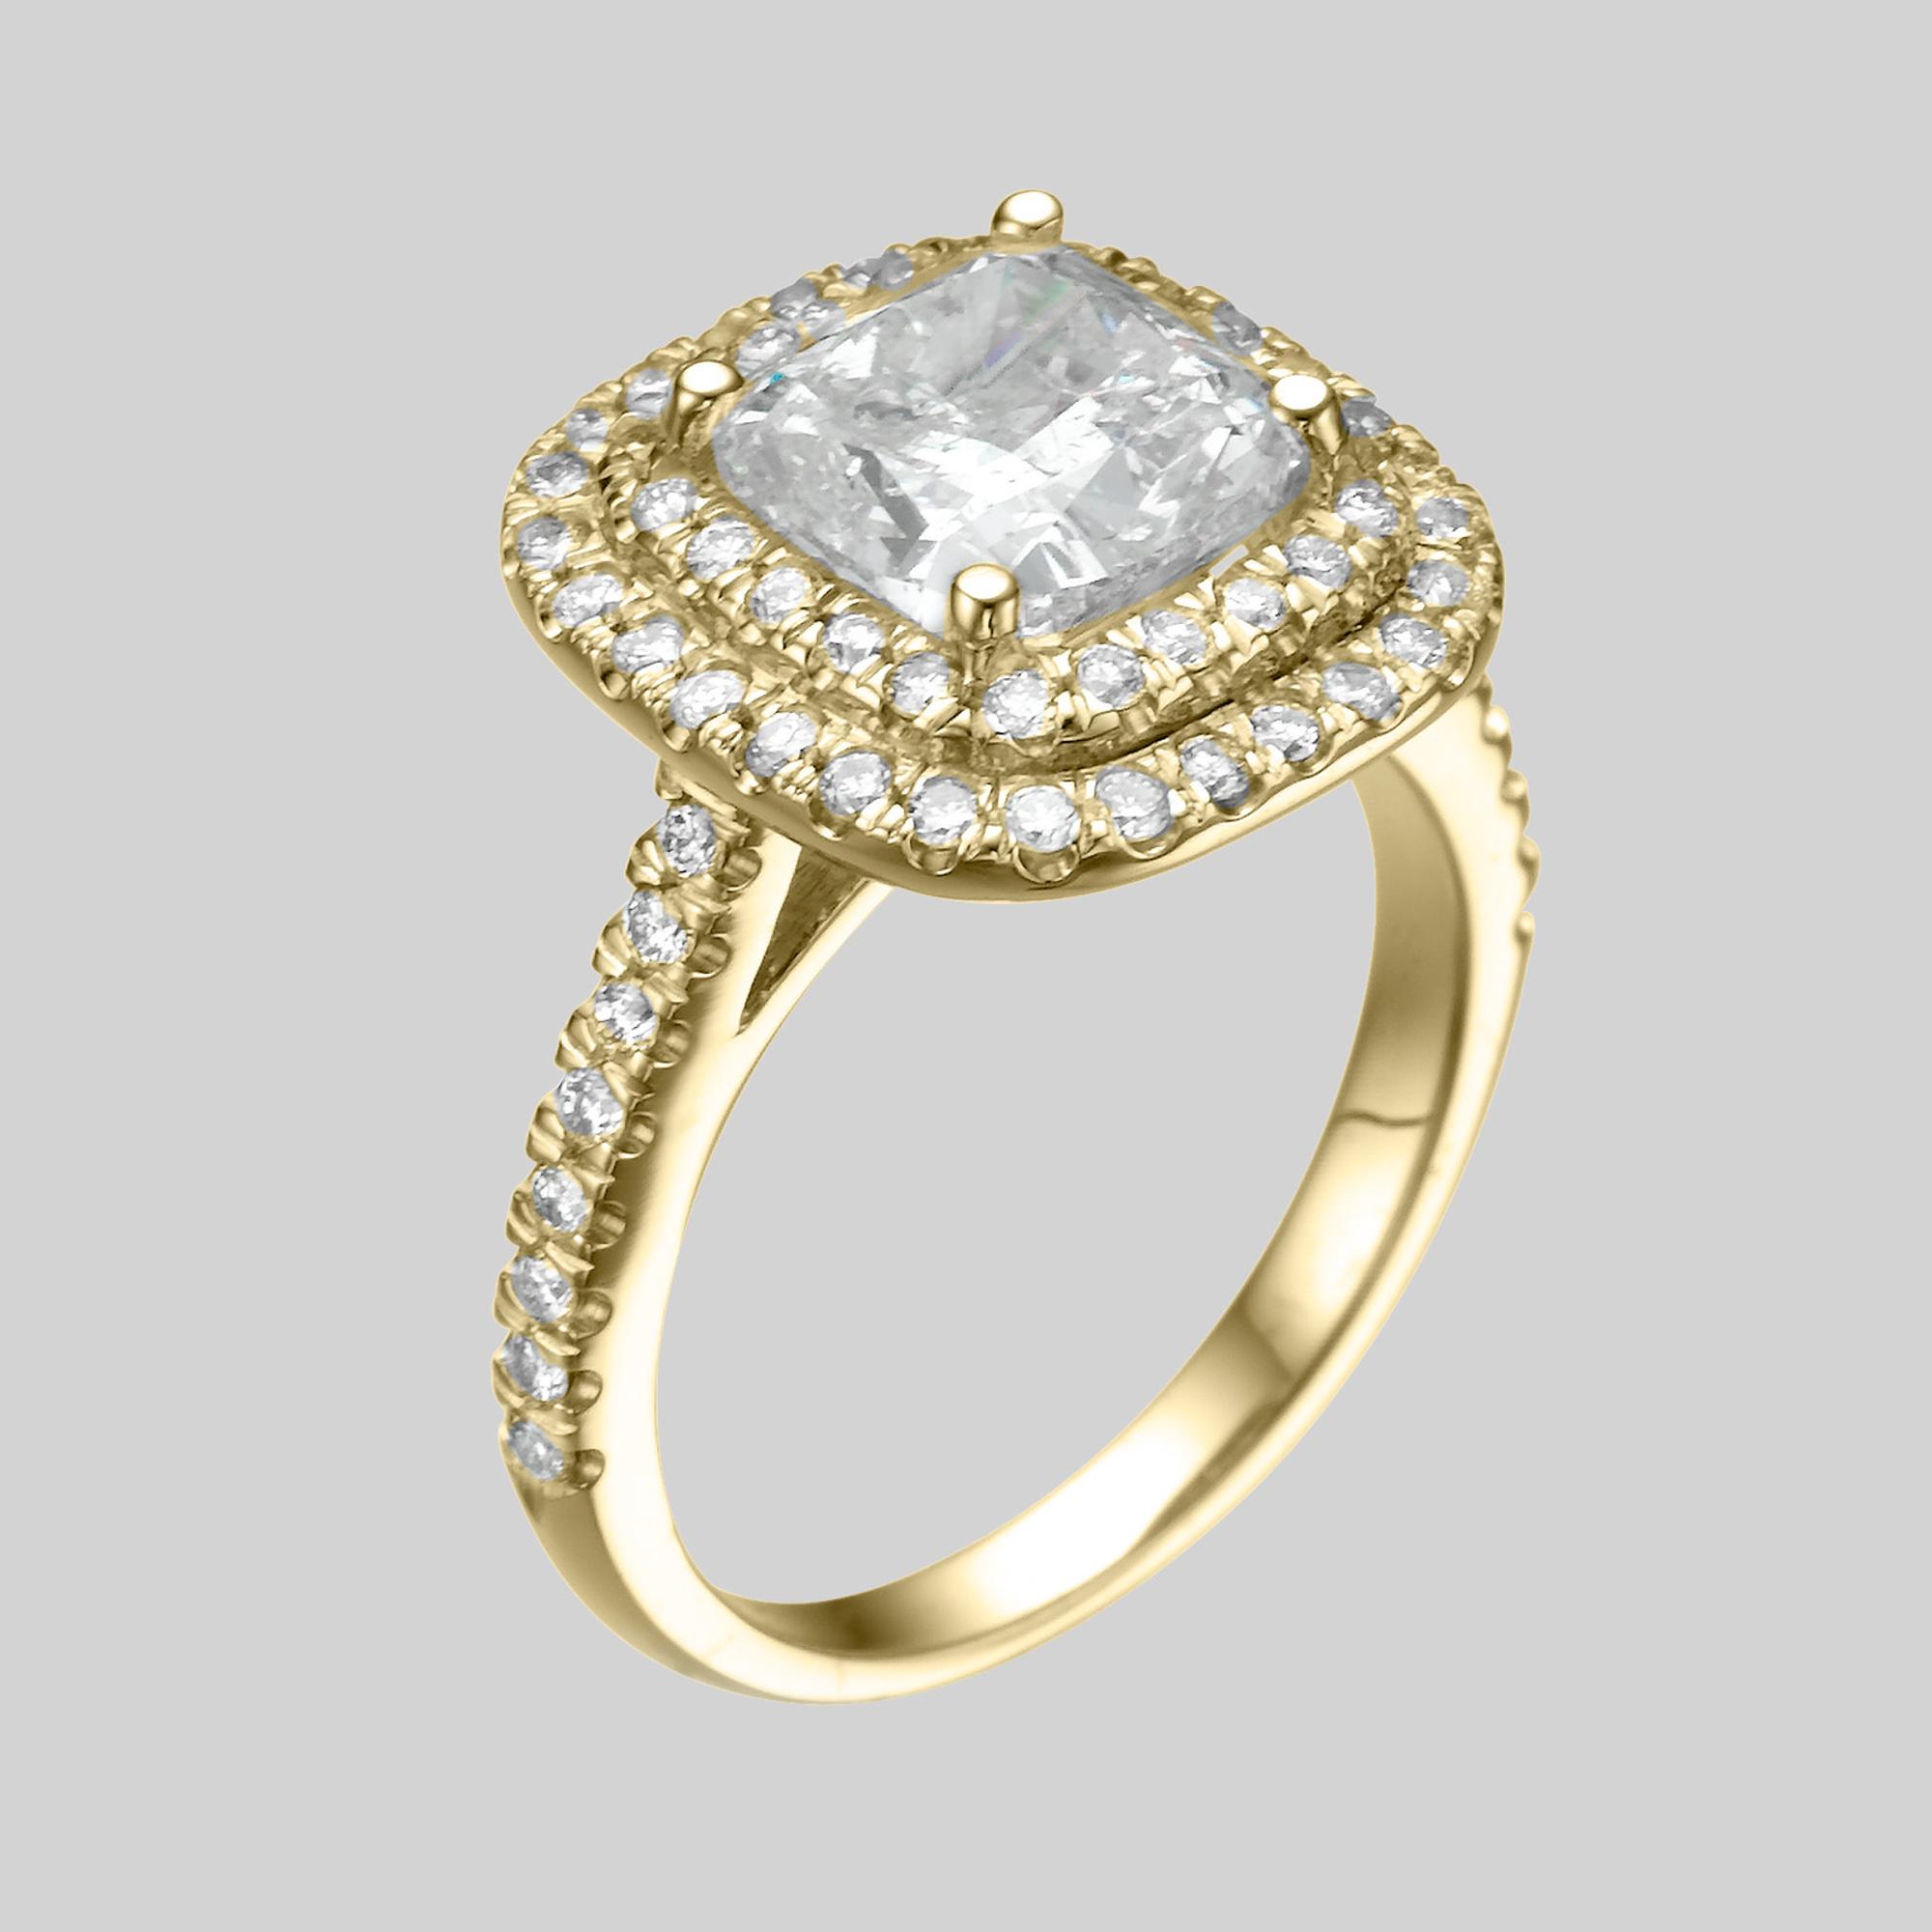 2 2 3 Carat D SI1 Bridal Diamond Engagement Ring Enhanced Cushion 14K White G